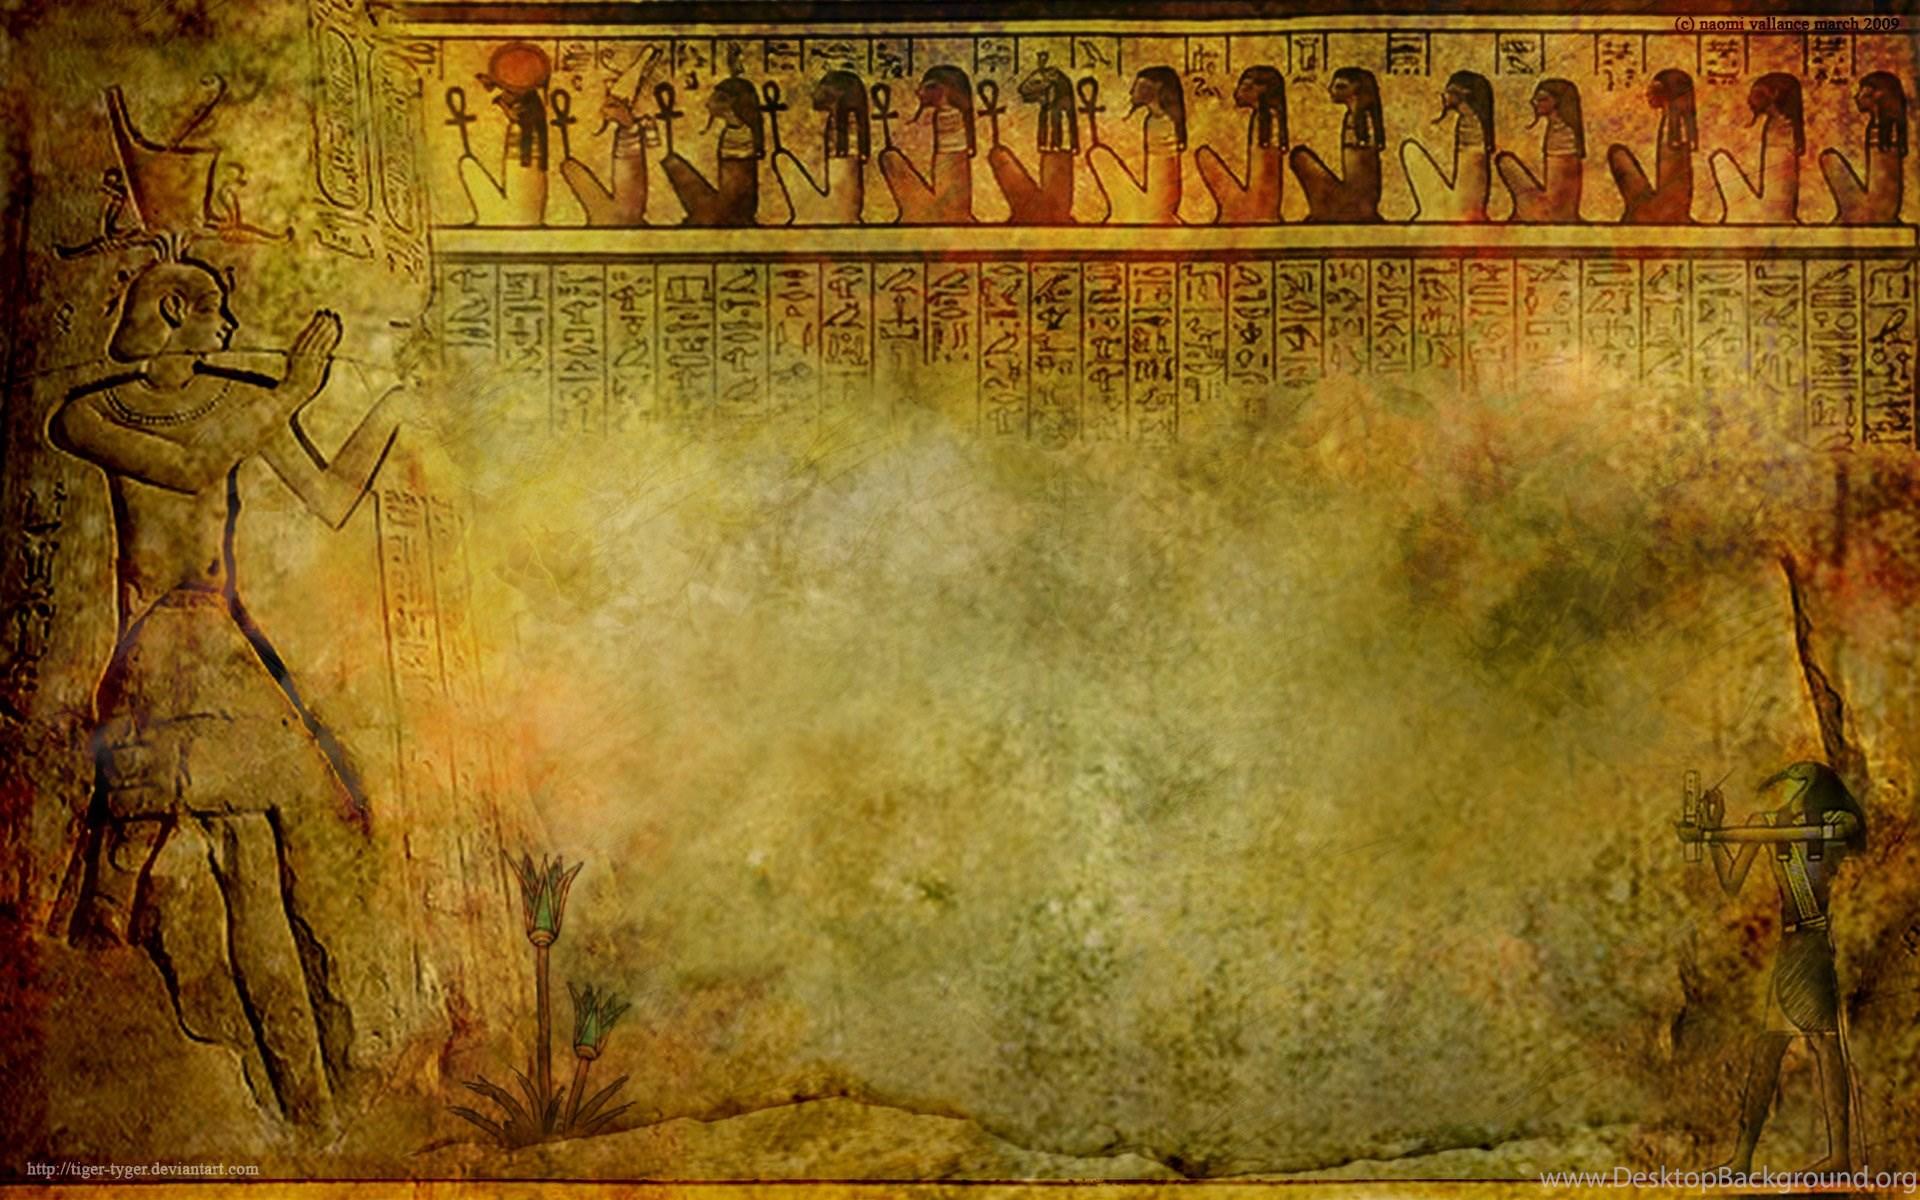 Hình nền powerpoint lịch sử Ai Cập